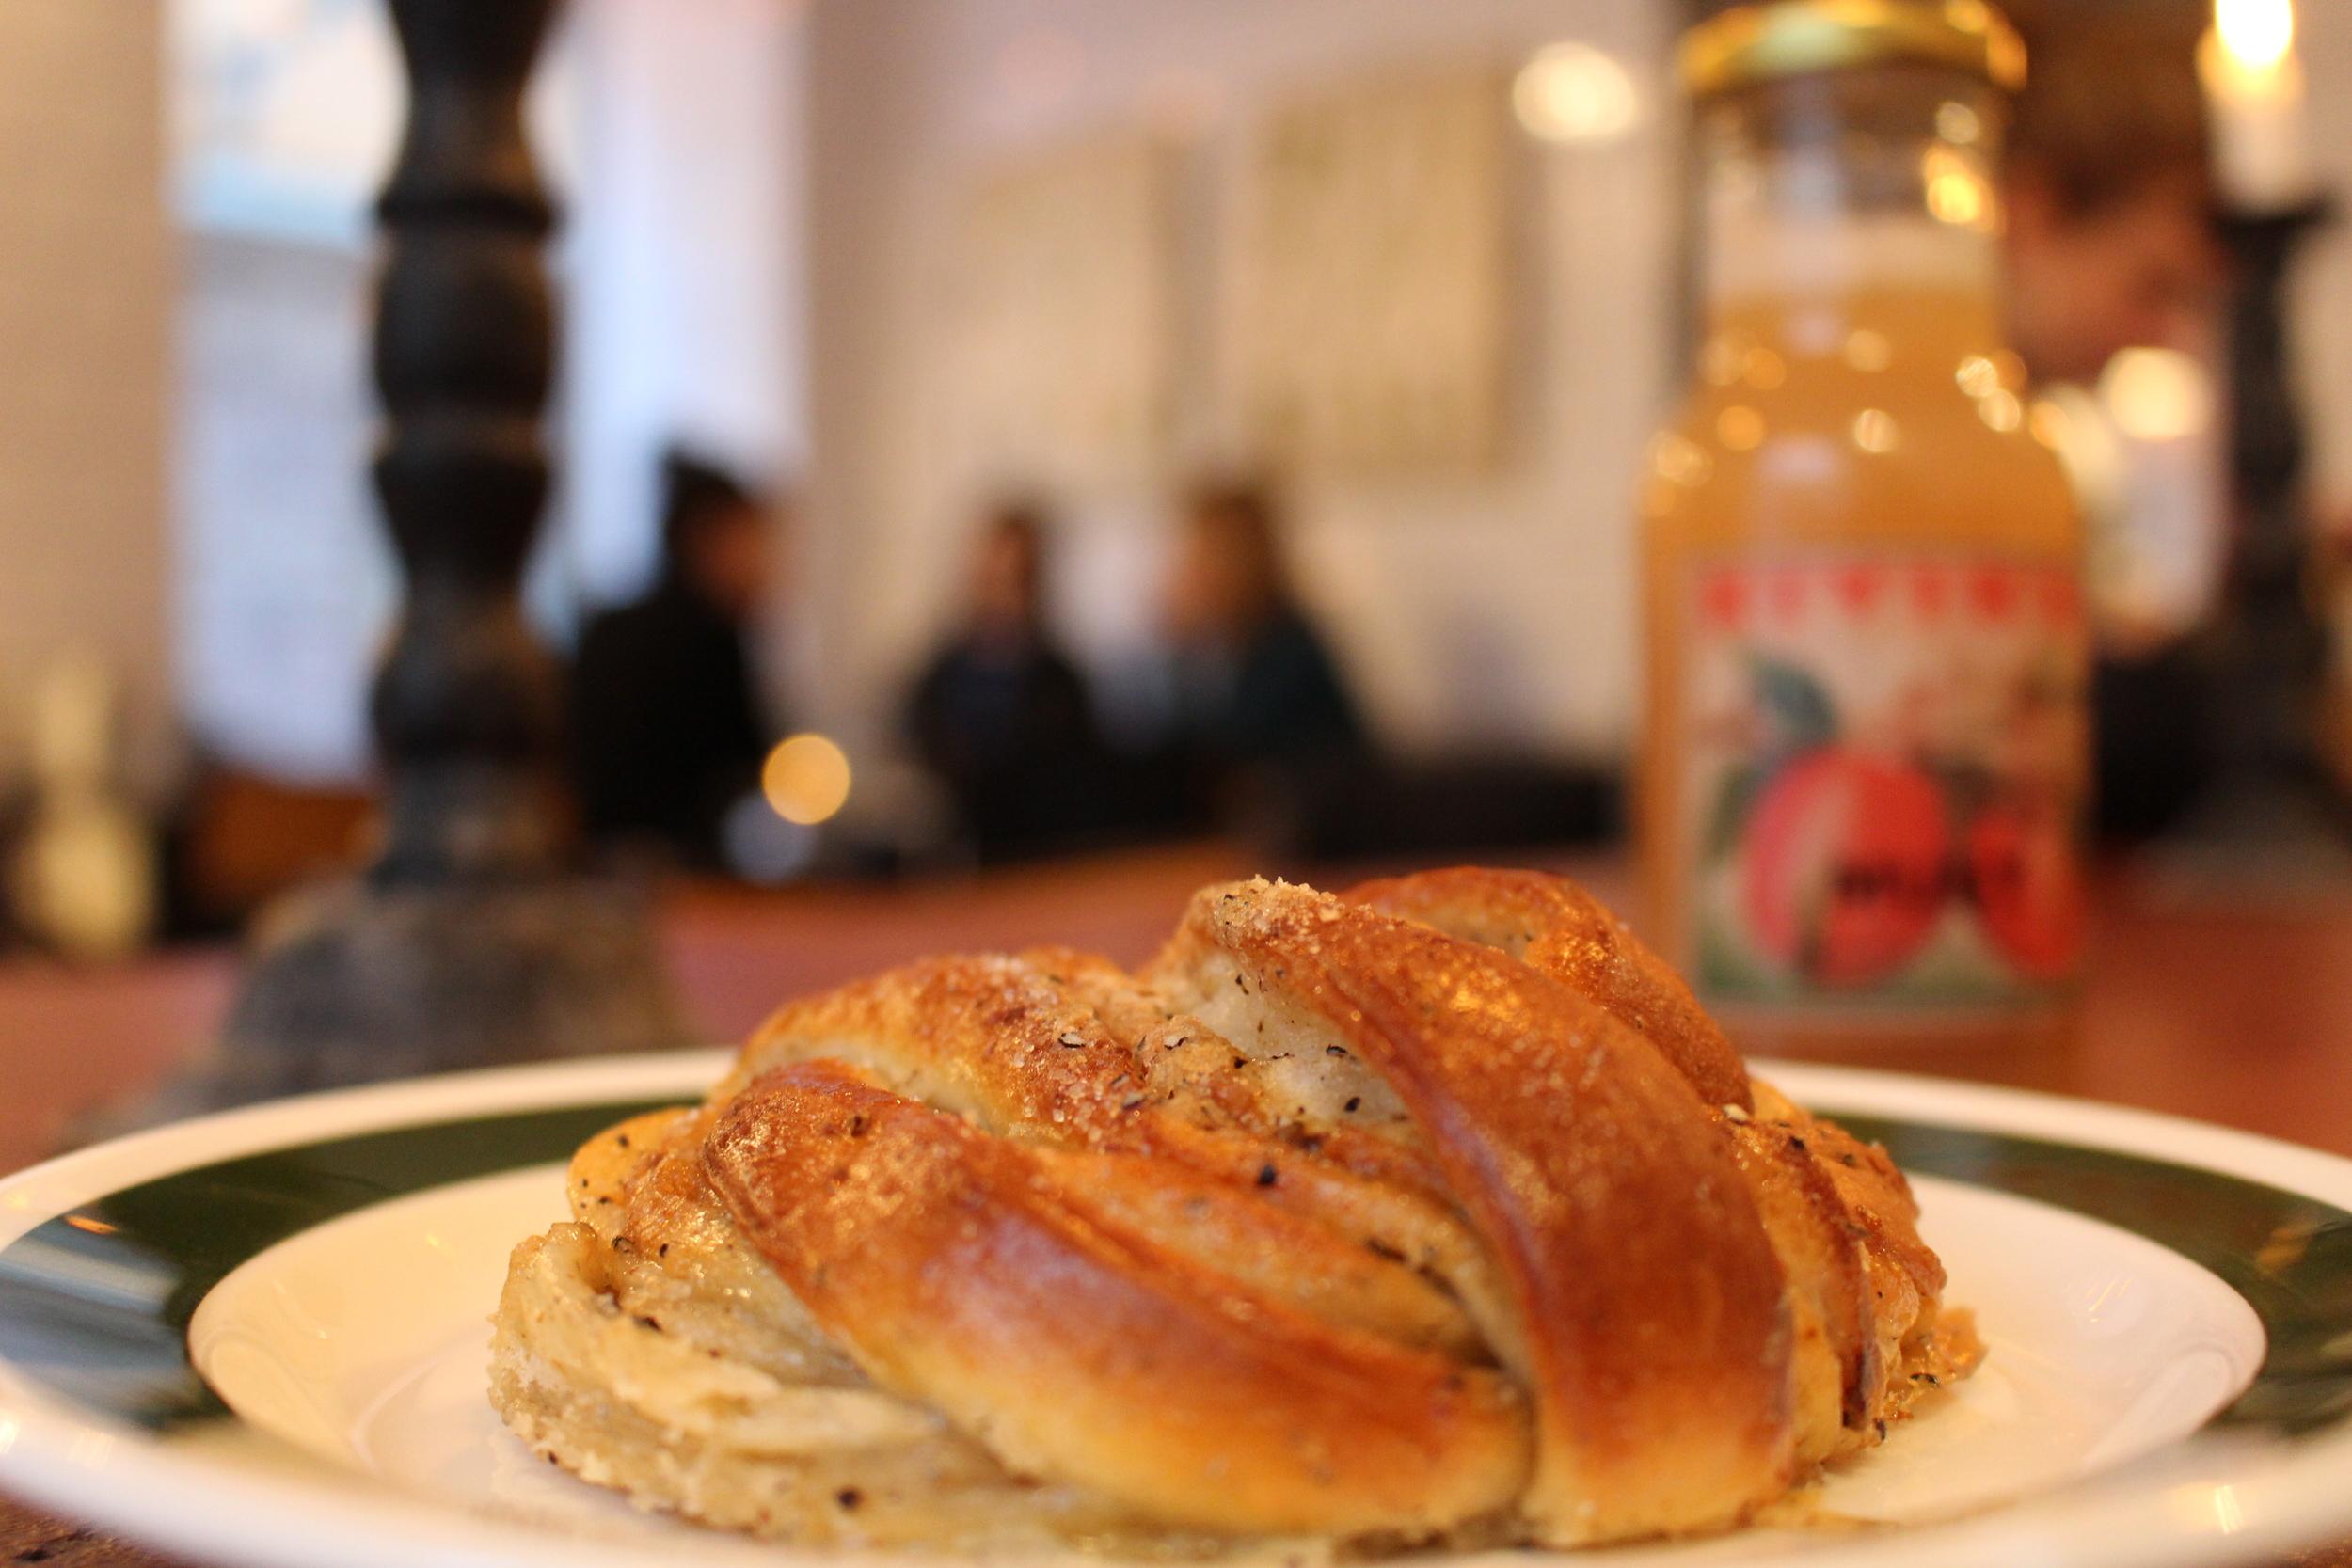 Cardamom Rolls, a Swedish pastry